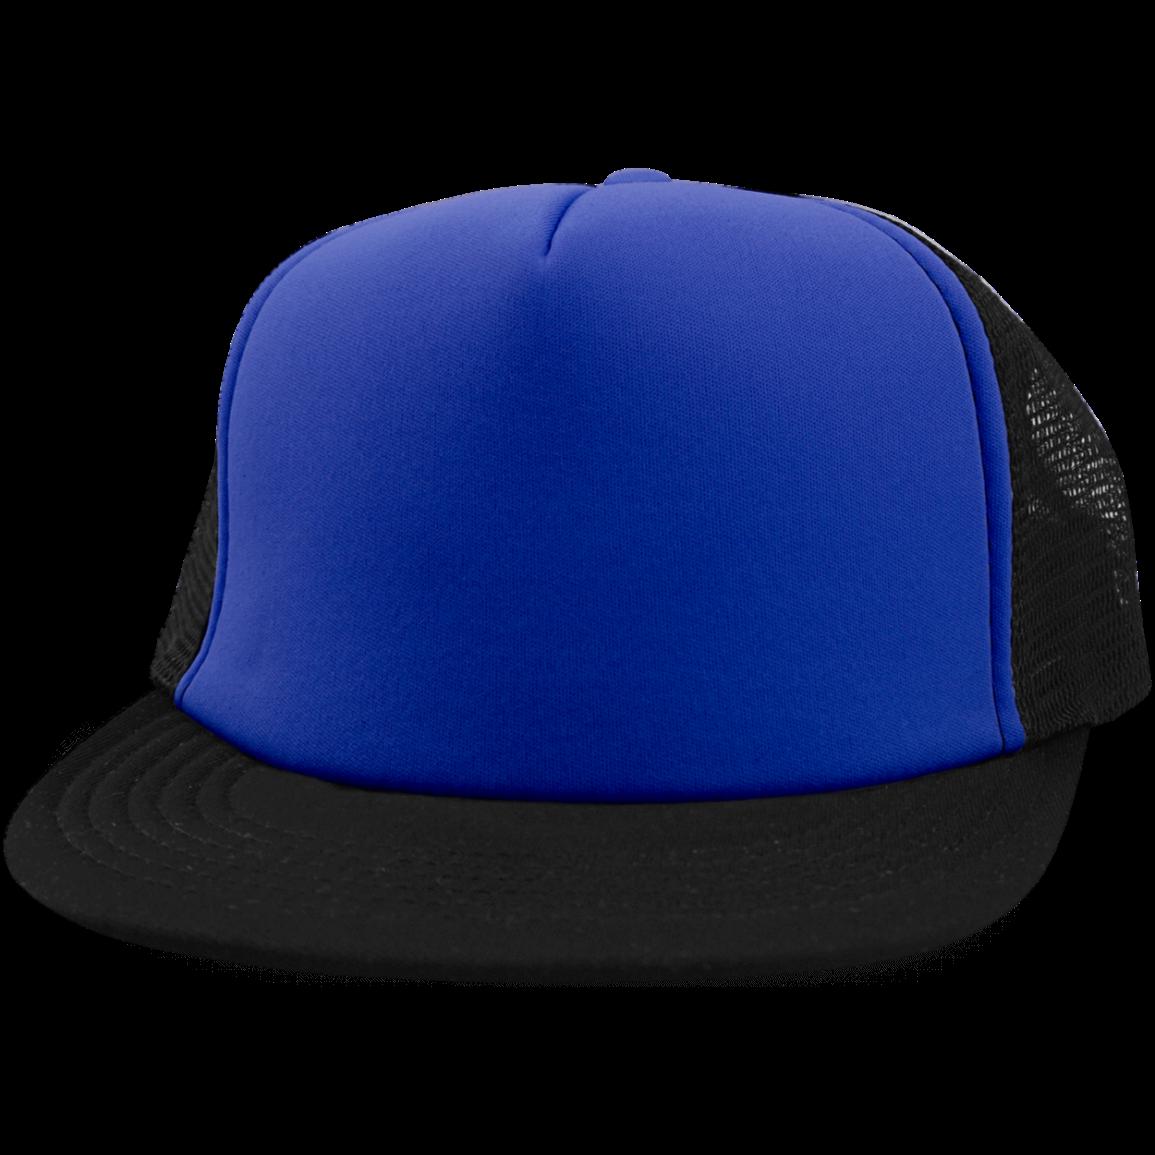 9b5a99960 Canon-McMillan Senior High School Trucker Hat with Snapback - SpiritShop.com